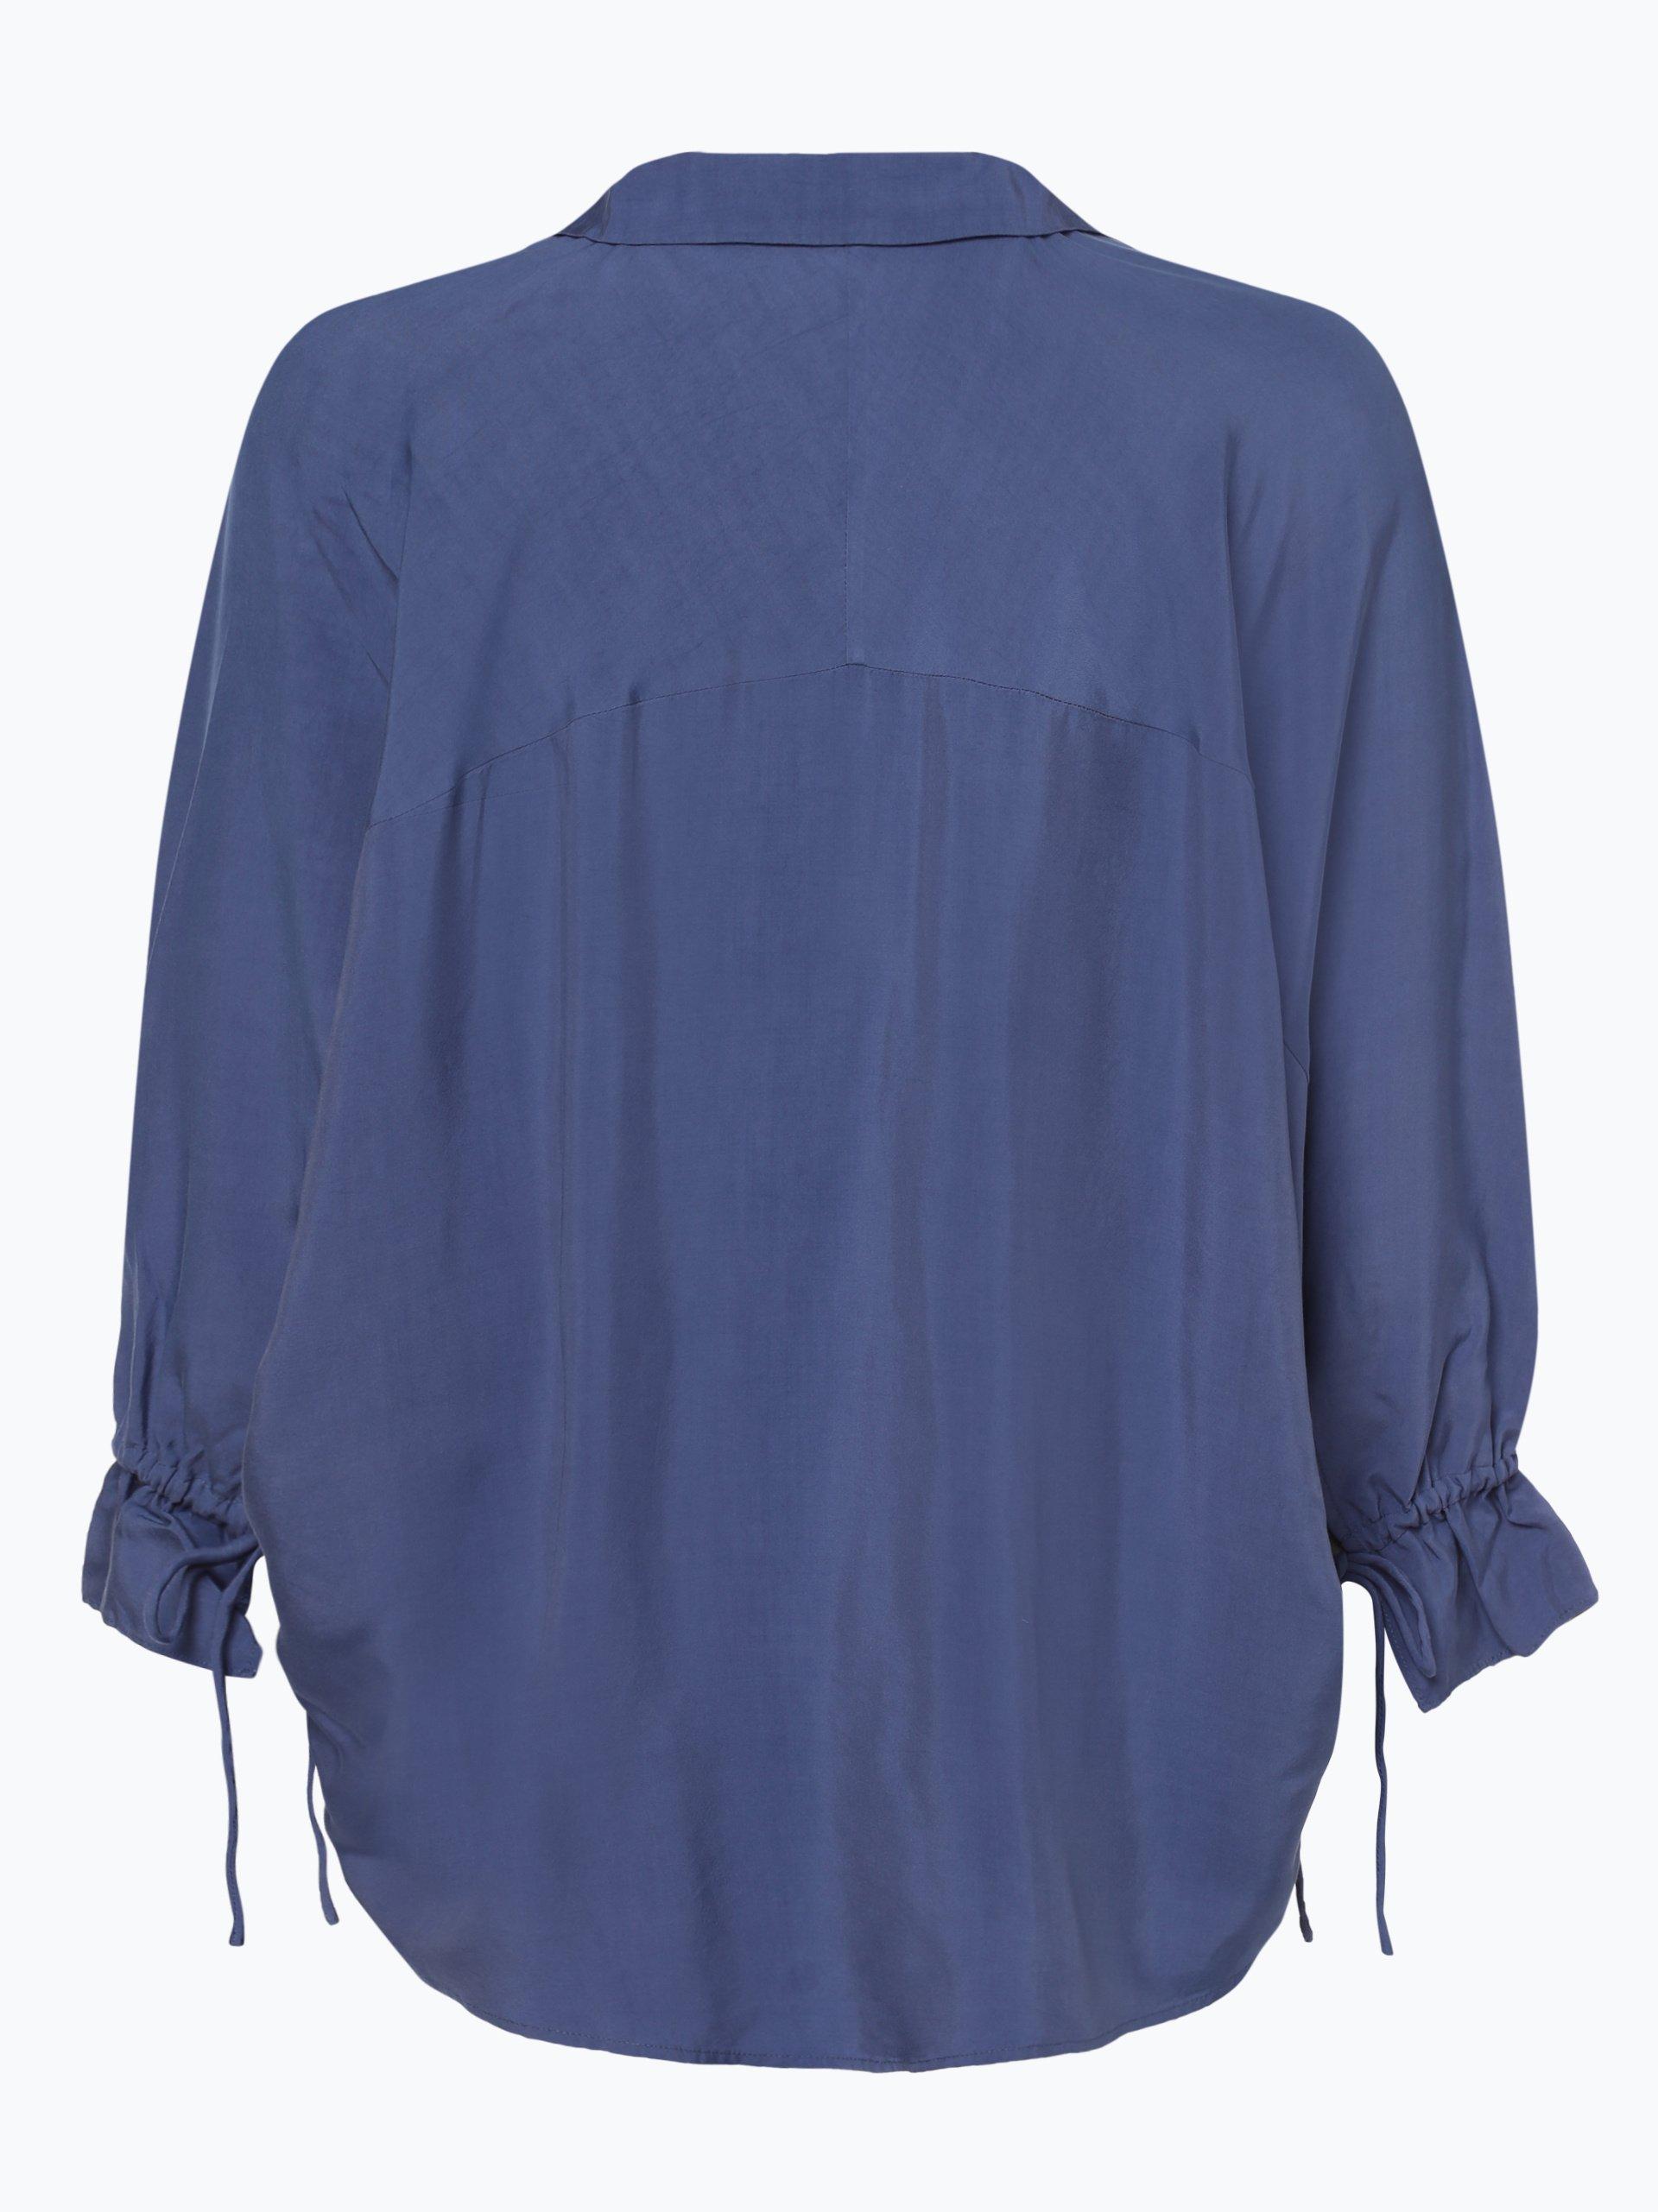 BOSS Casual Damen Blusenshirt - Elast